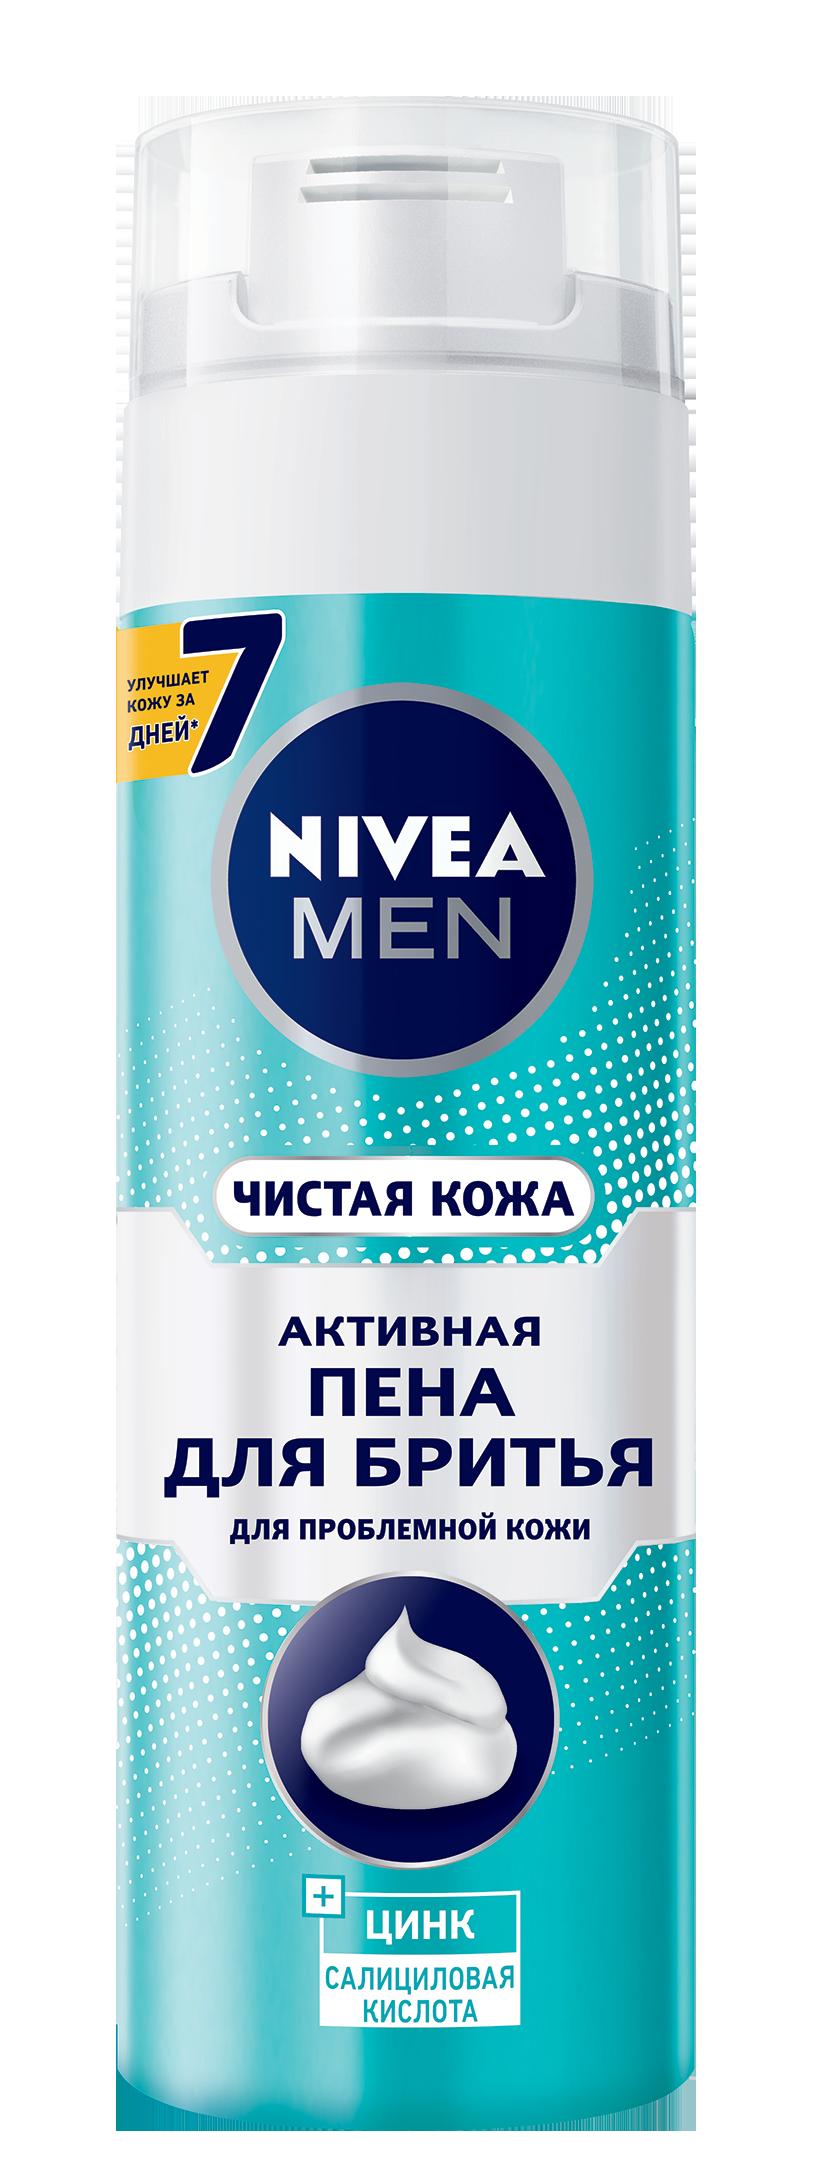 Пена для бритья Nivea Чистая кожа